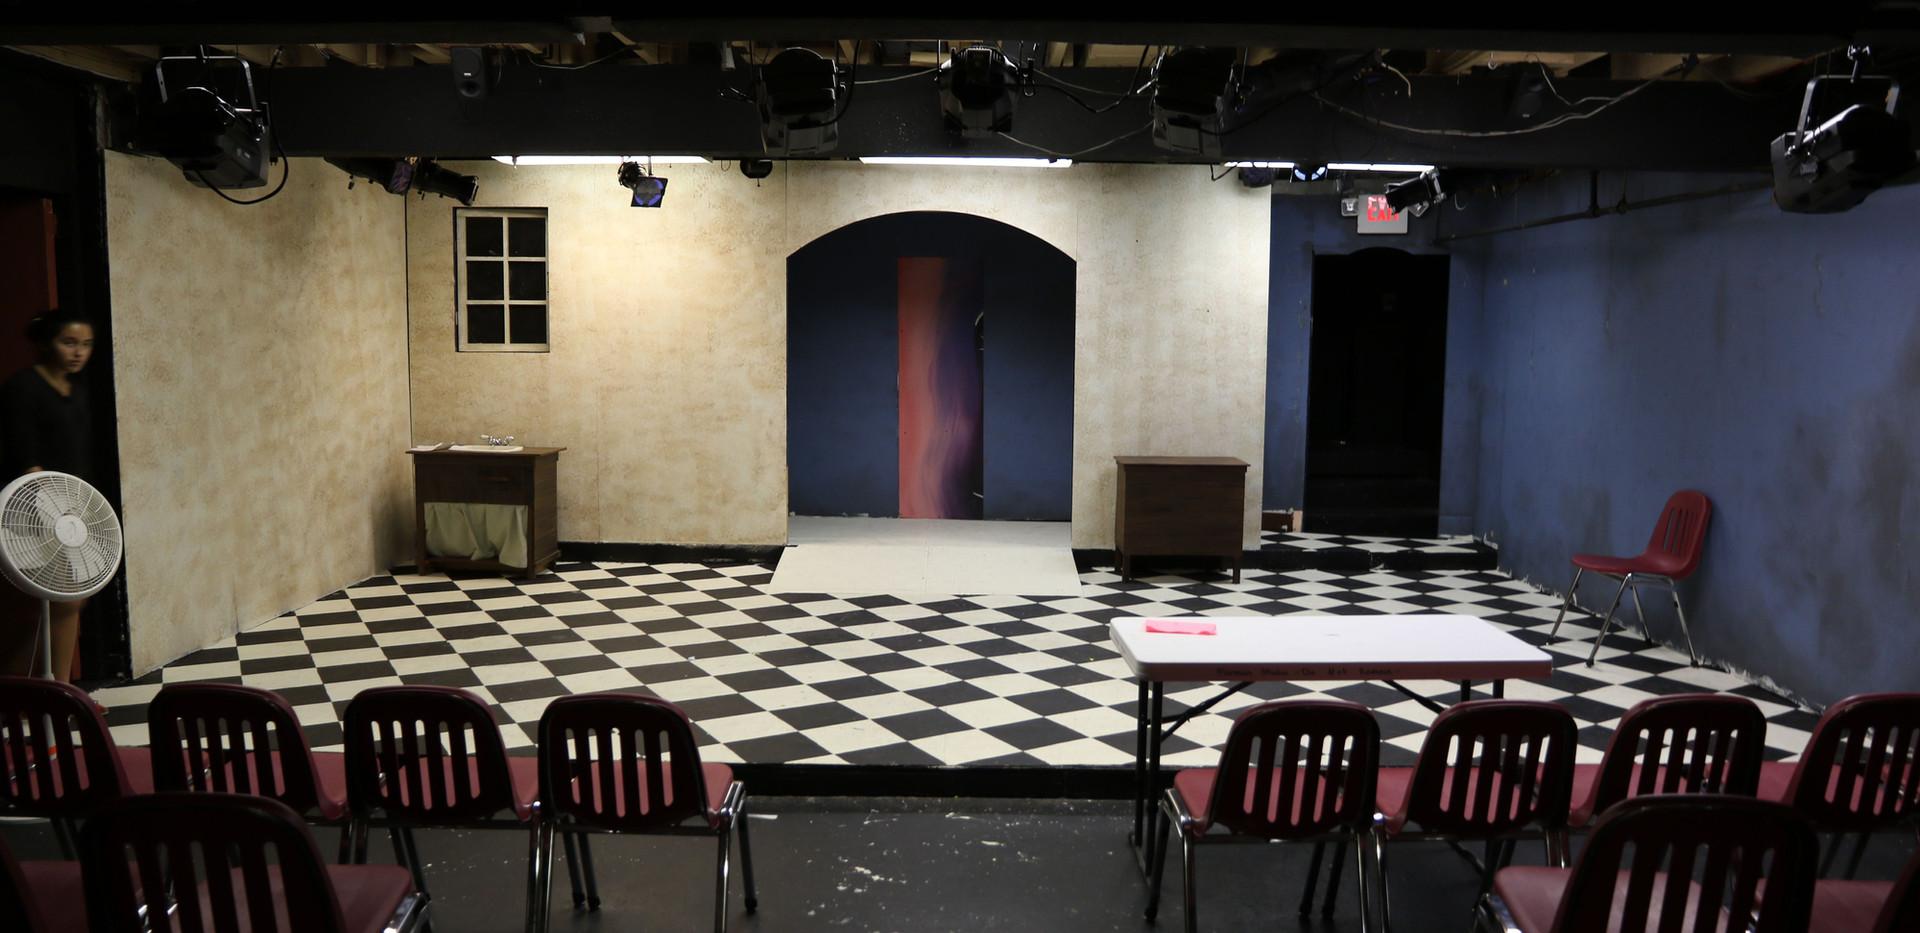 The Merman Theater